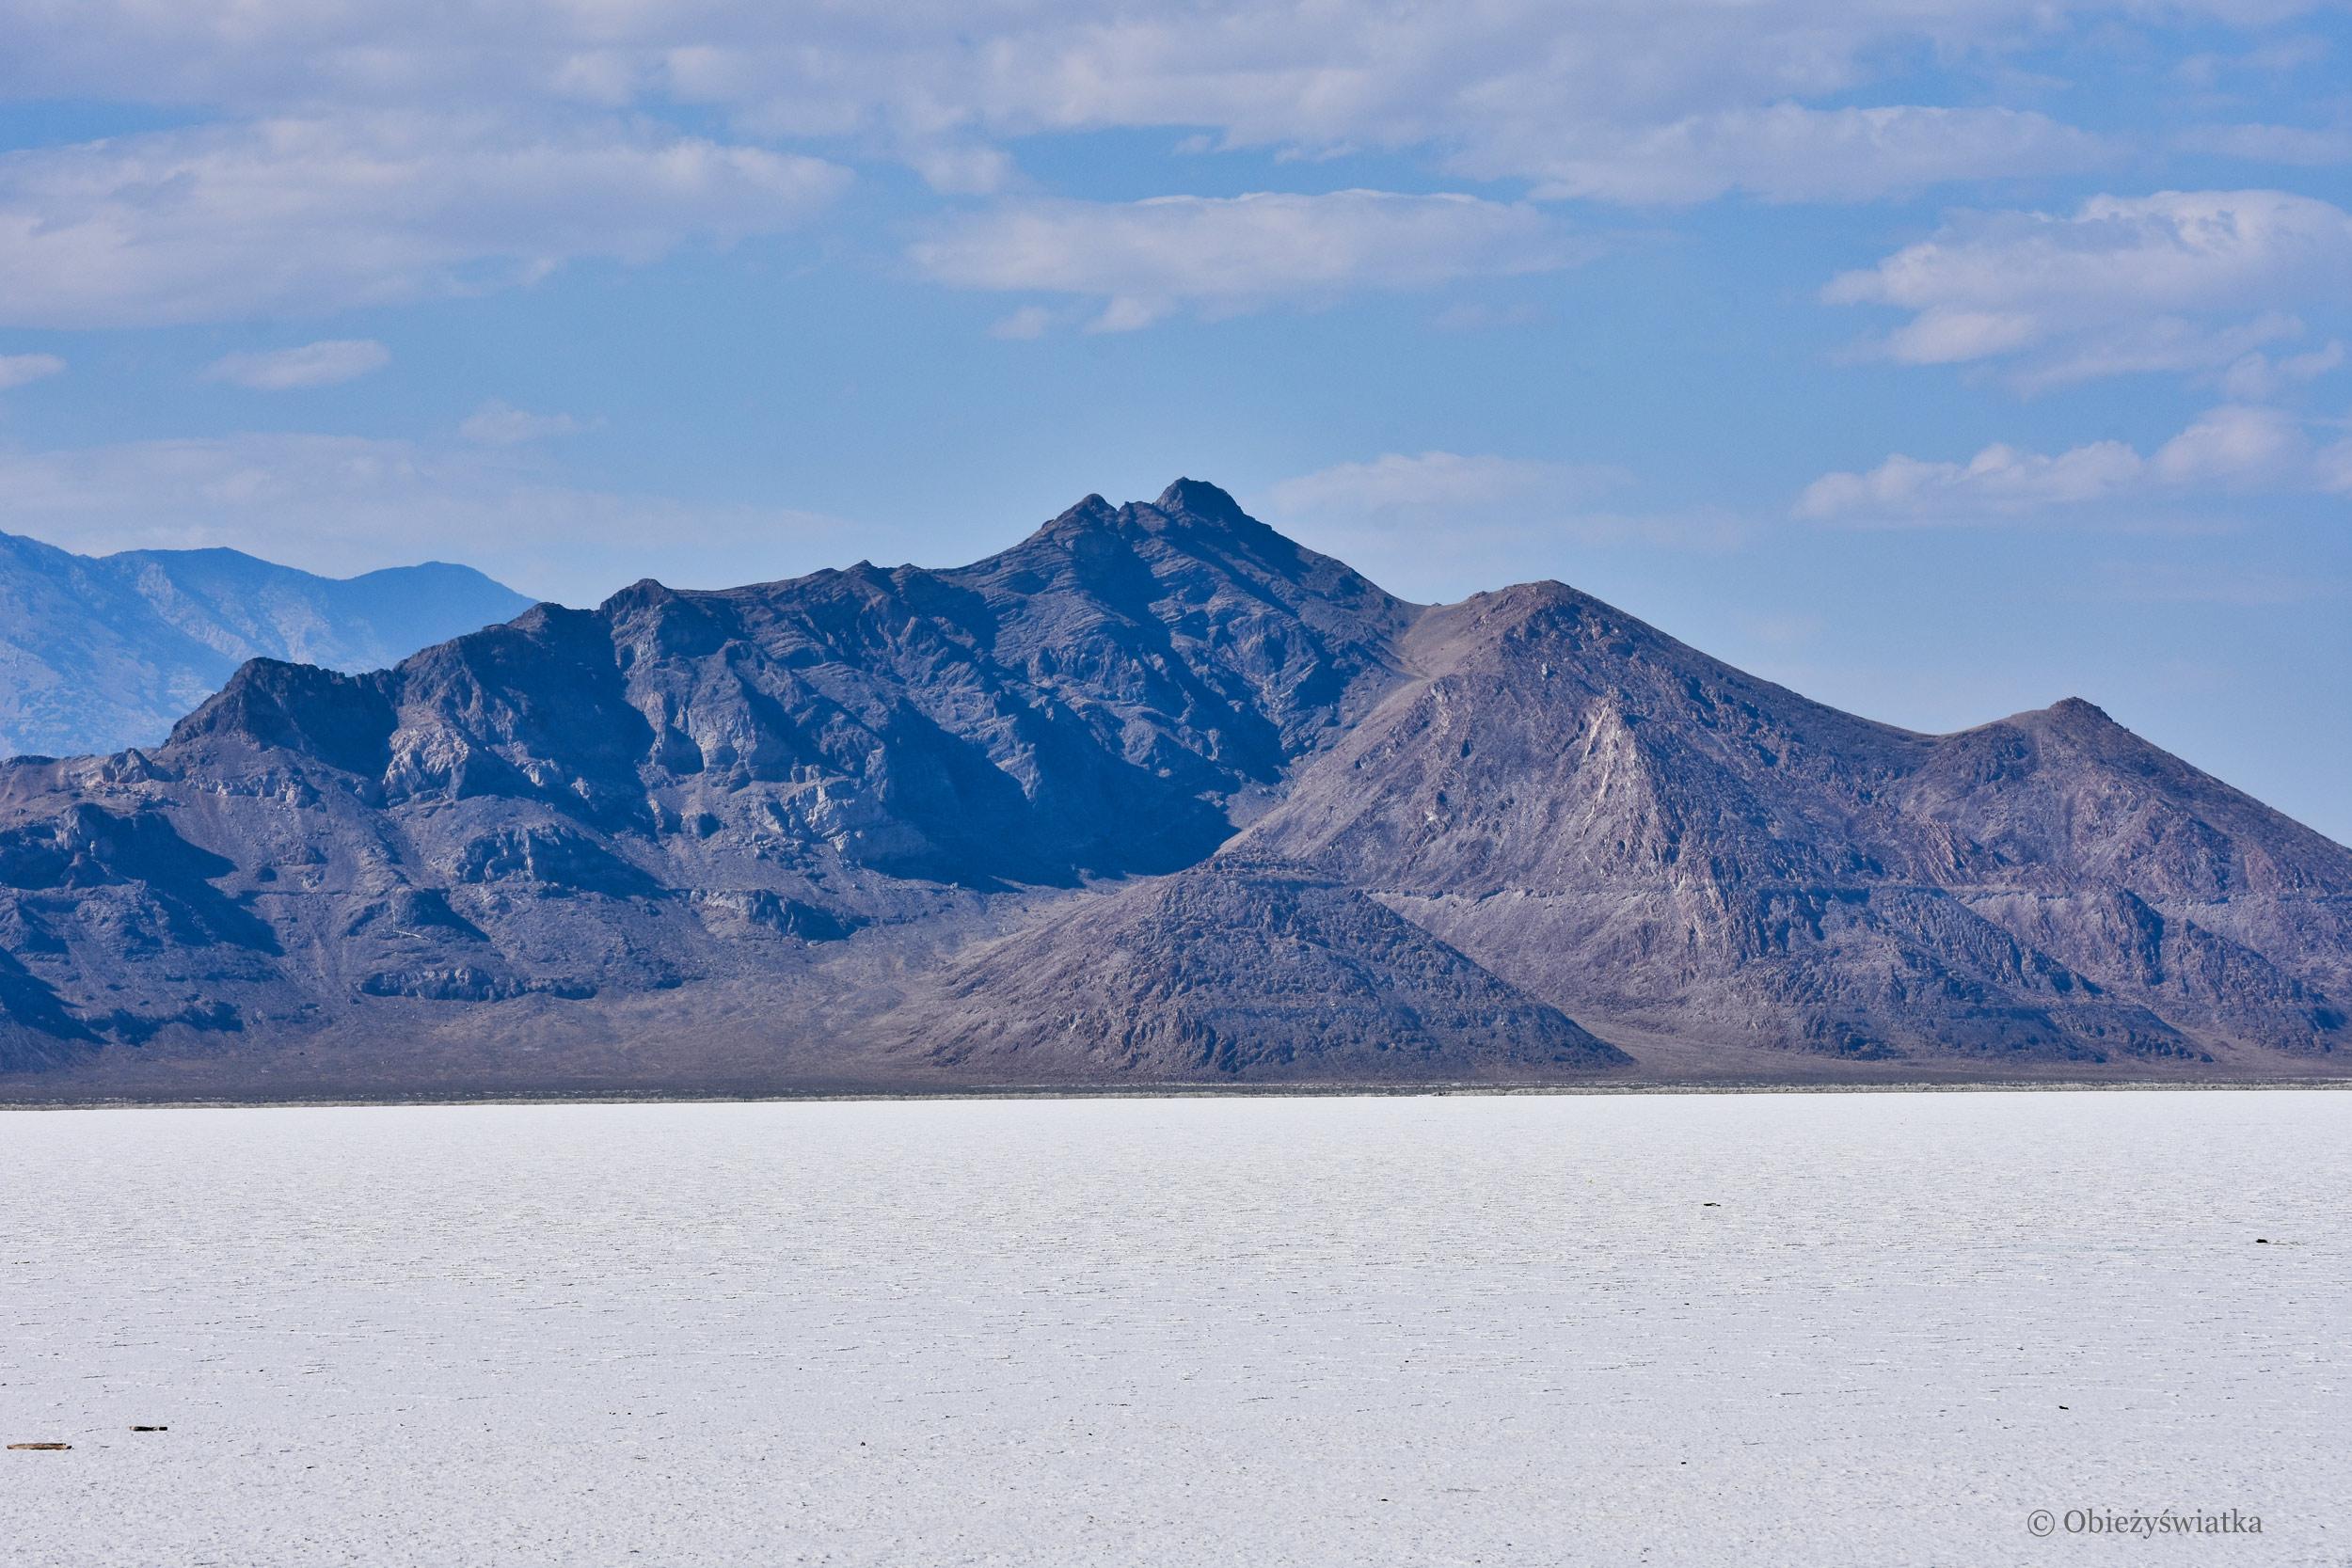 Krajobraz słonej pustyni, Great Salt Lake Desert